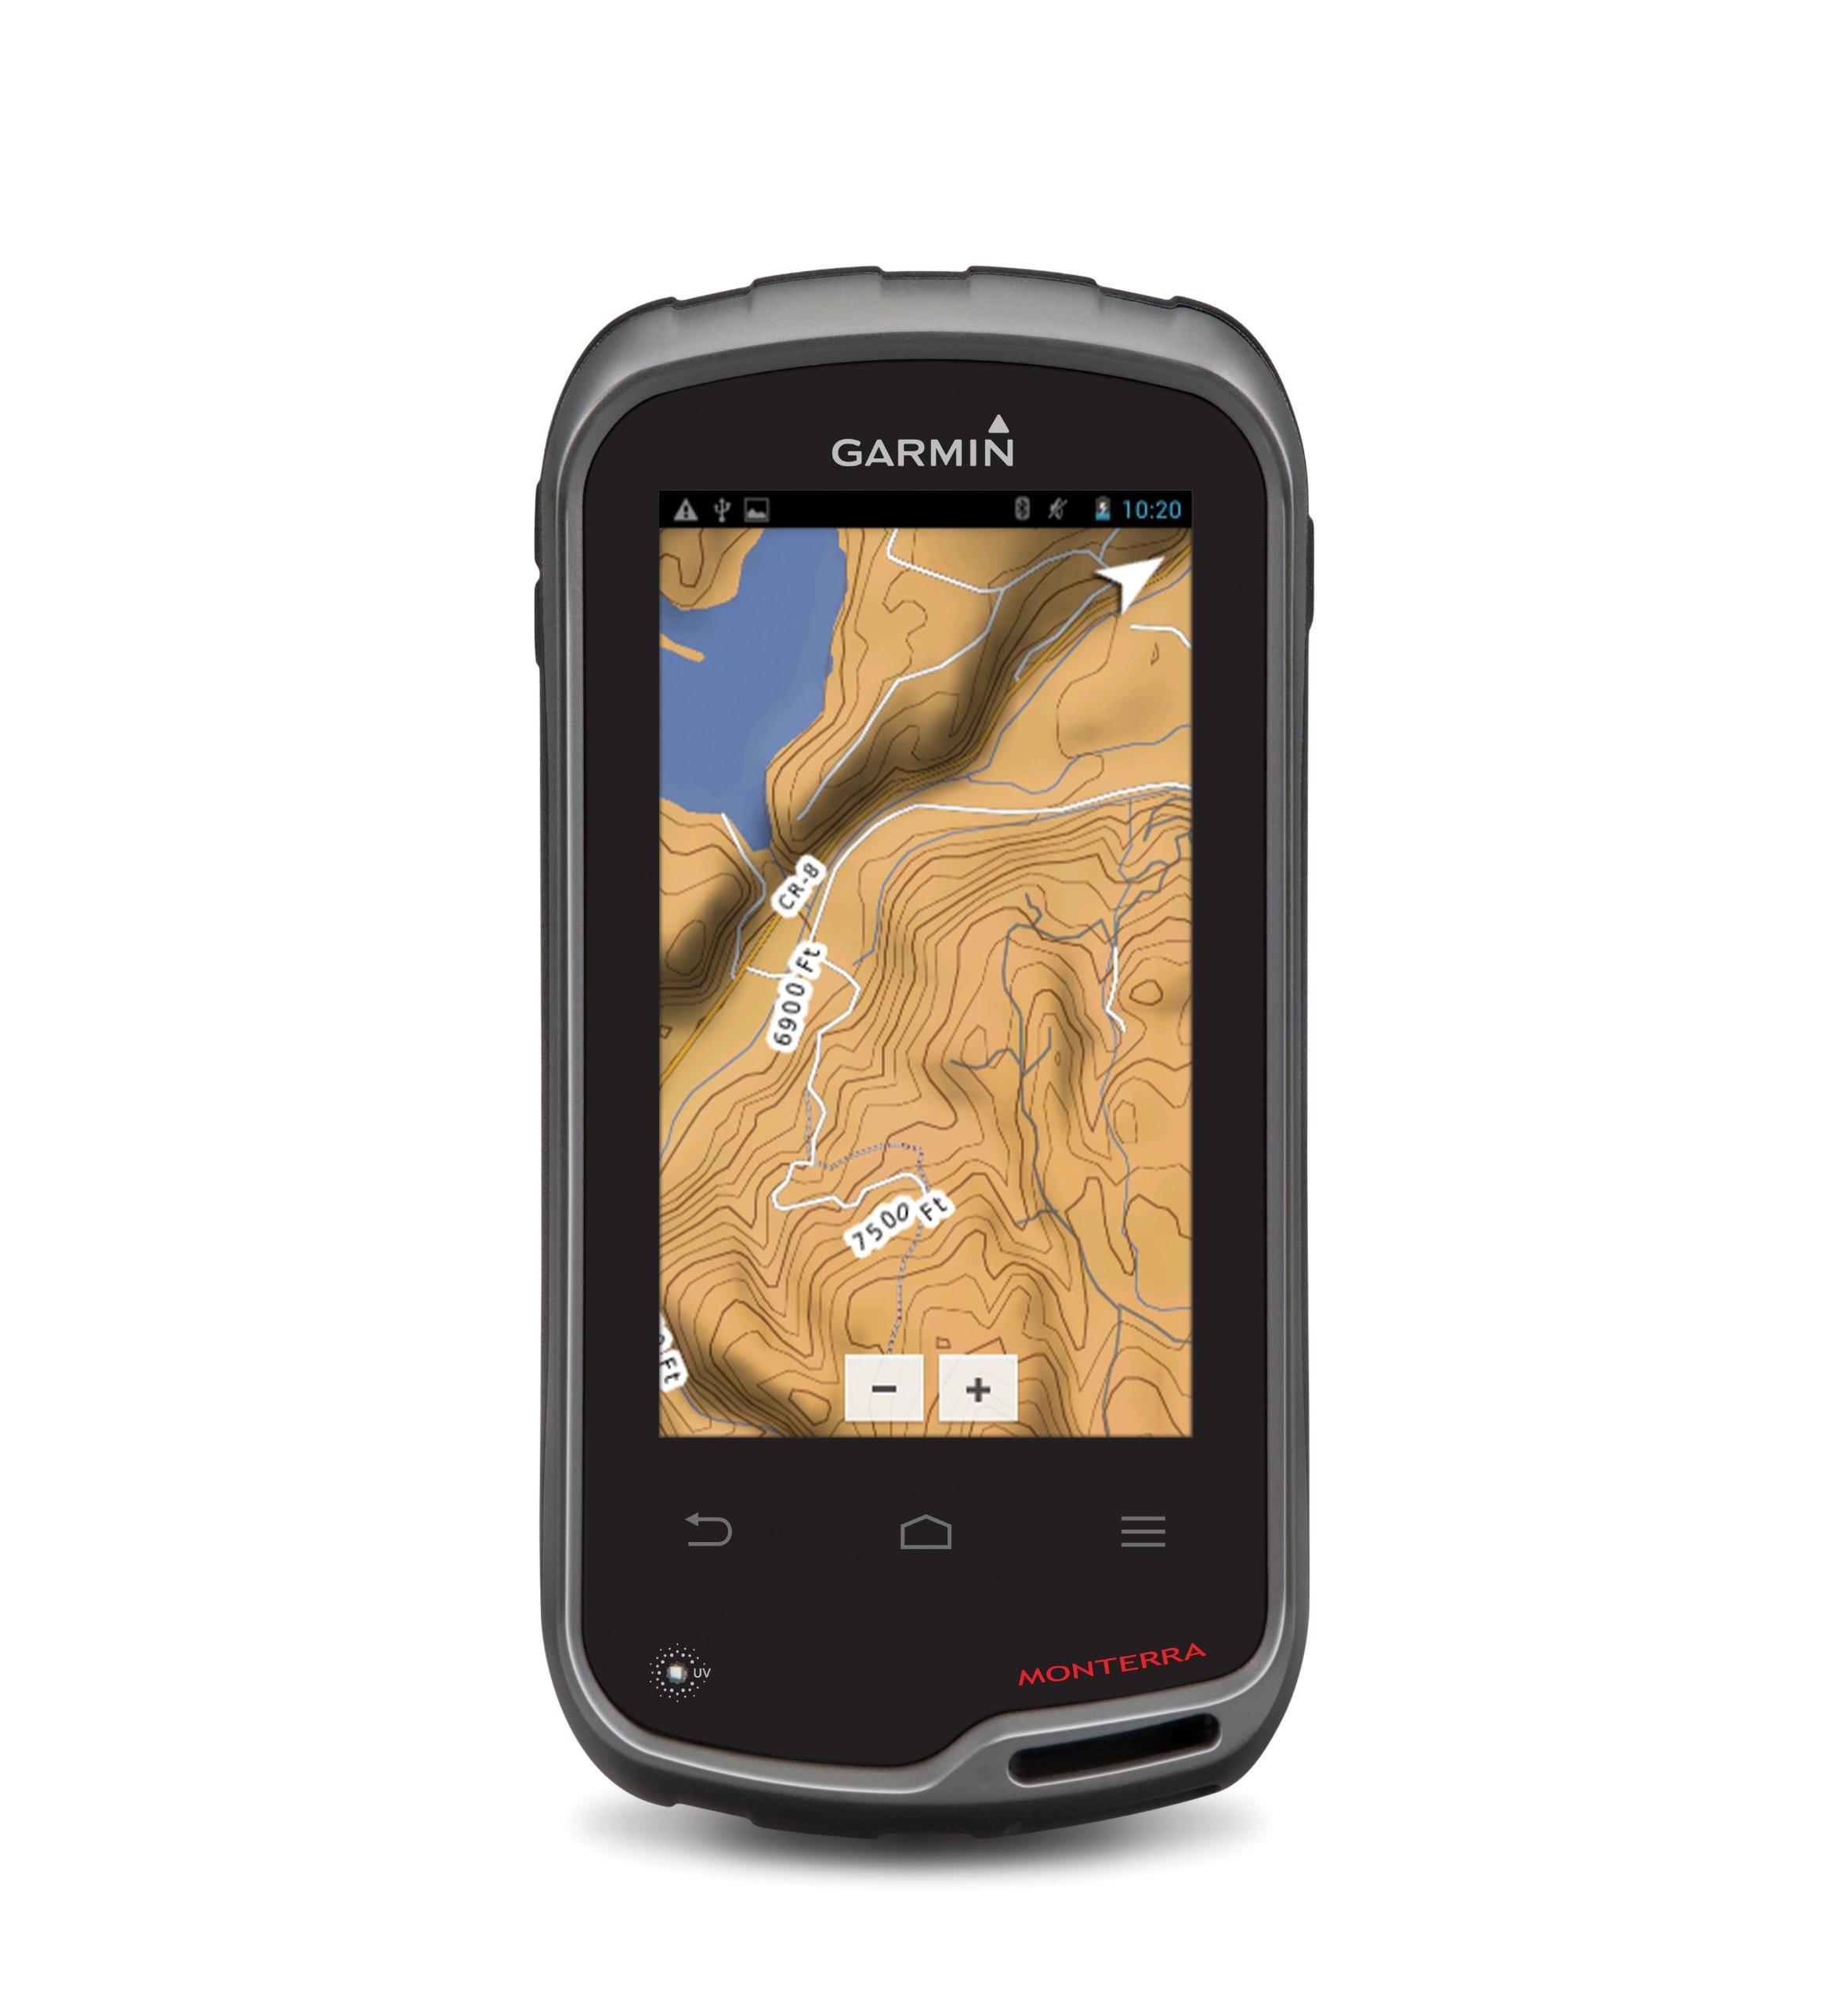 Garmin Monterra Wi-Fi Enabled GPS Navigator 010-01065-00 (4'' Display, 8MP Camera, GPS, Google Play Apps,3D MapMerge)